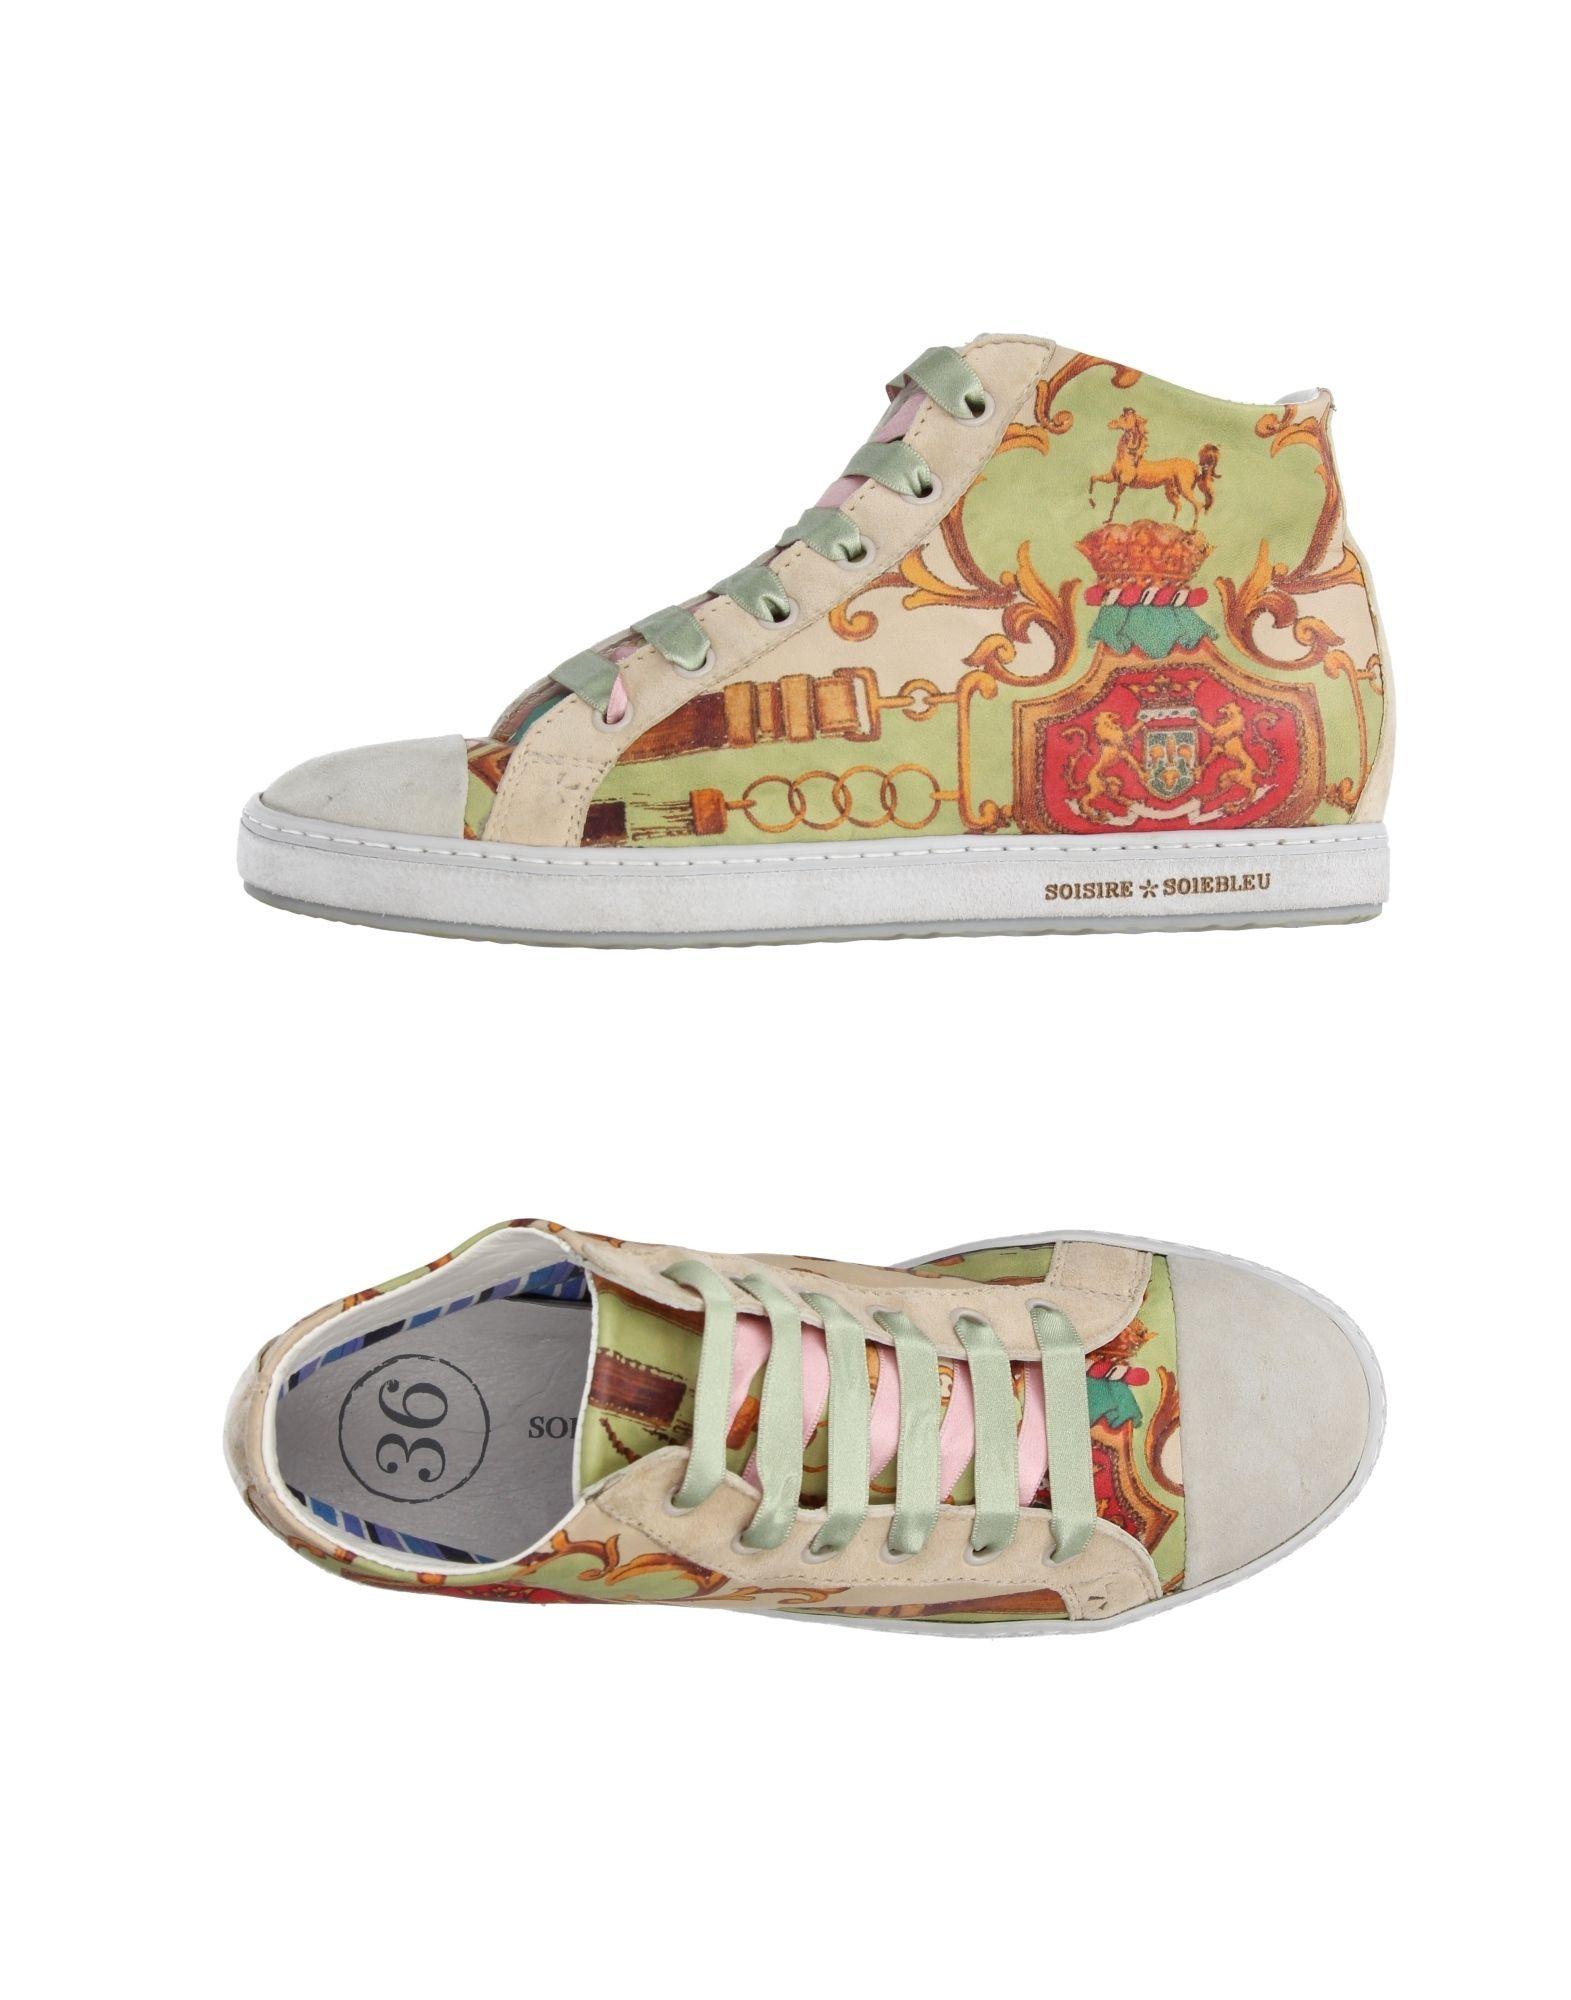 Sneakers Soisire Soiebleu Femme - Sneakers Soisire Soiebleu sur